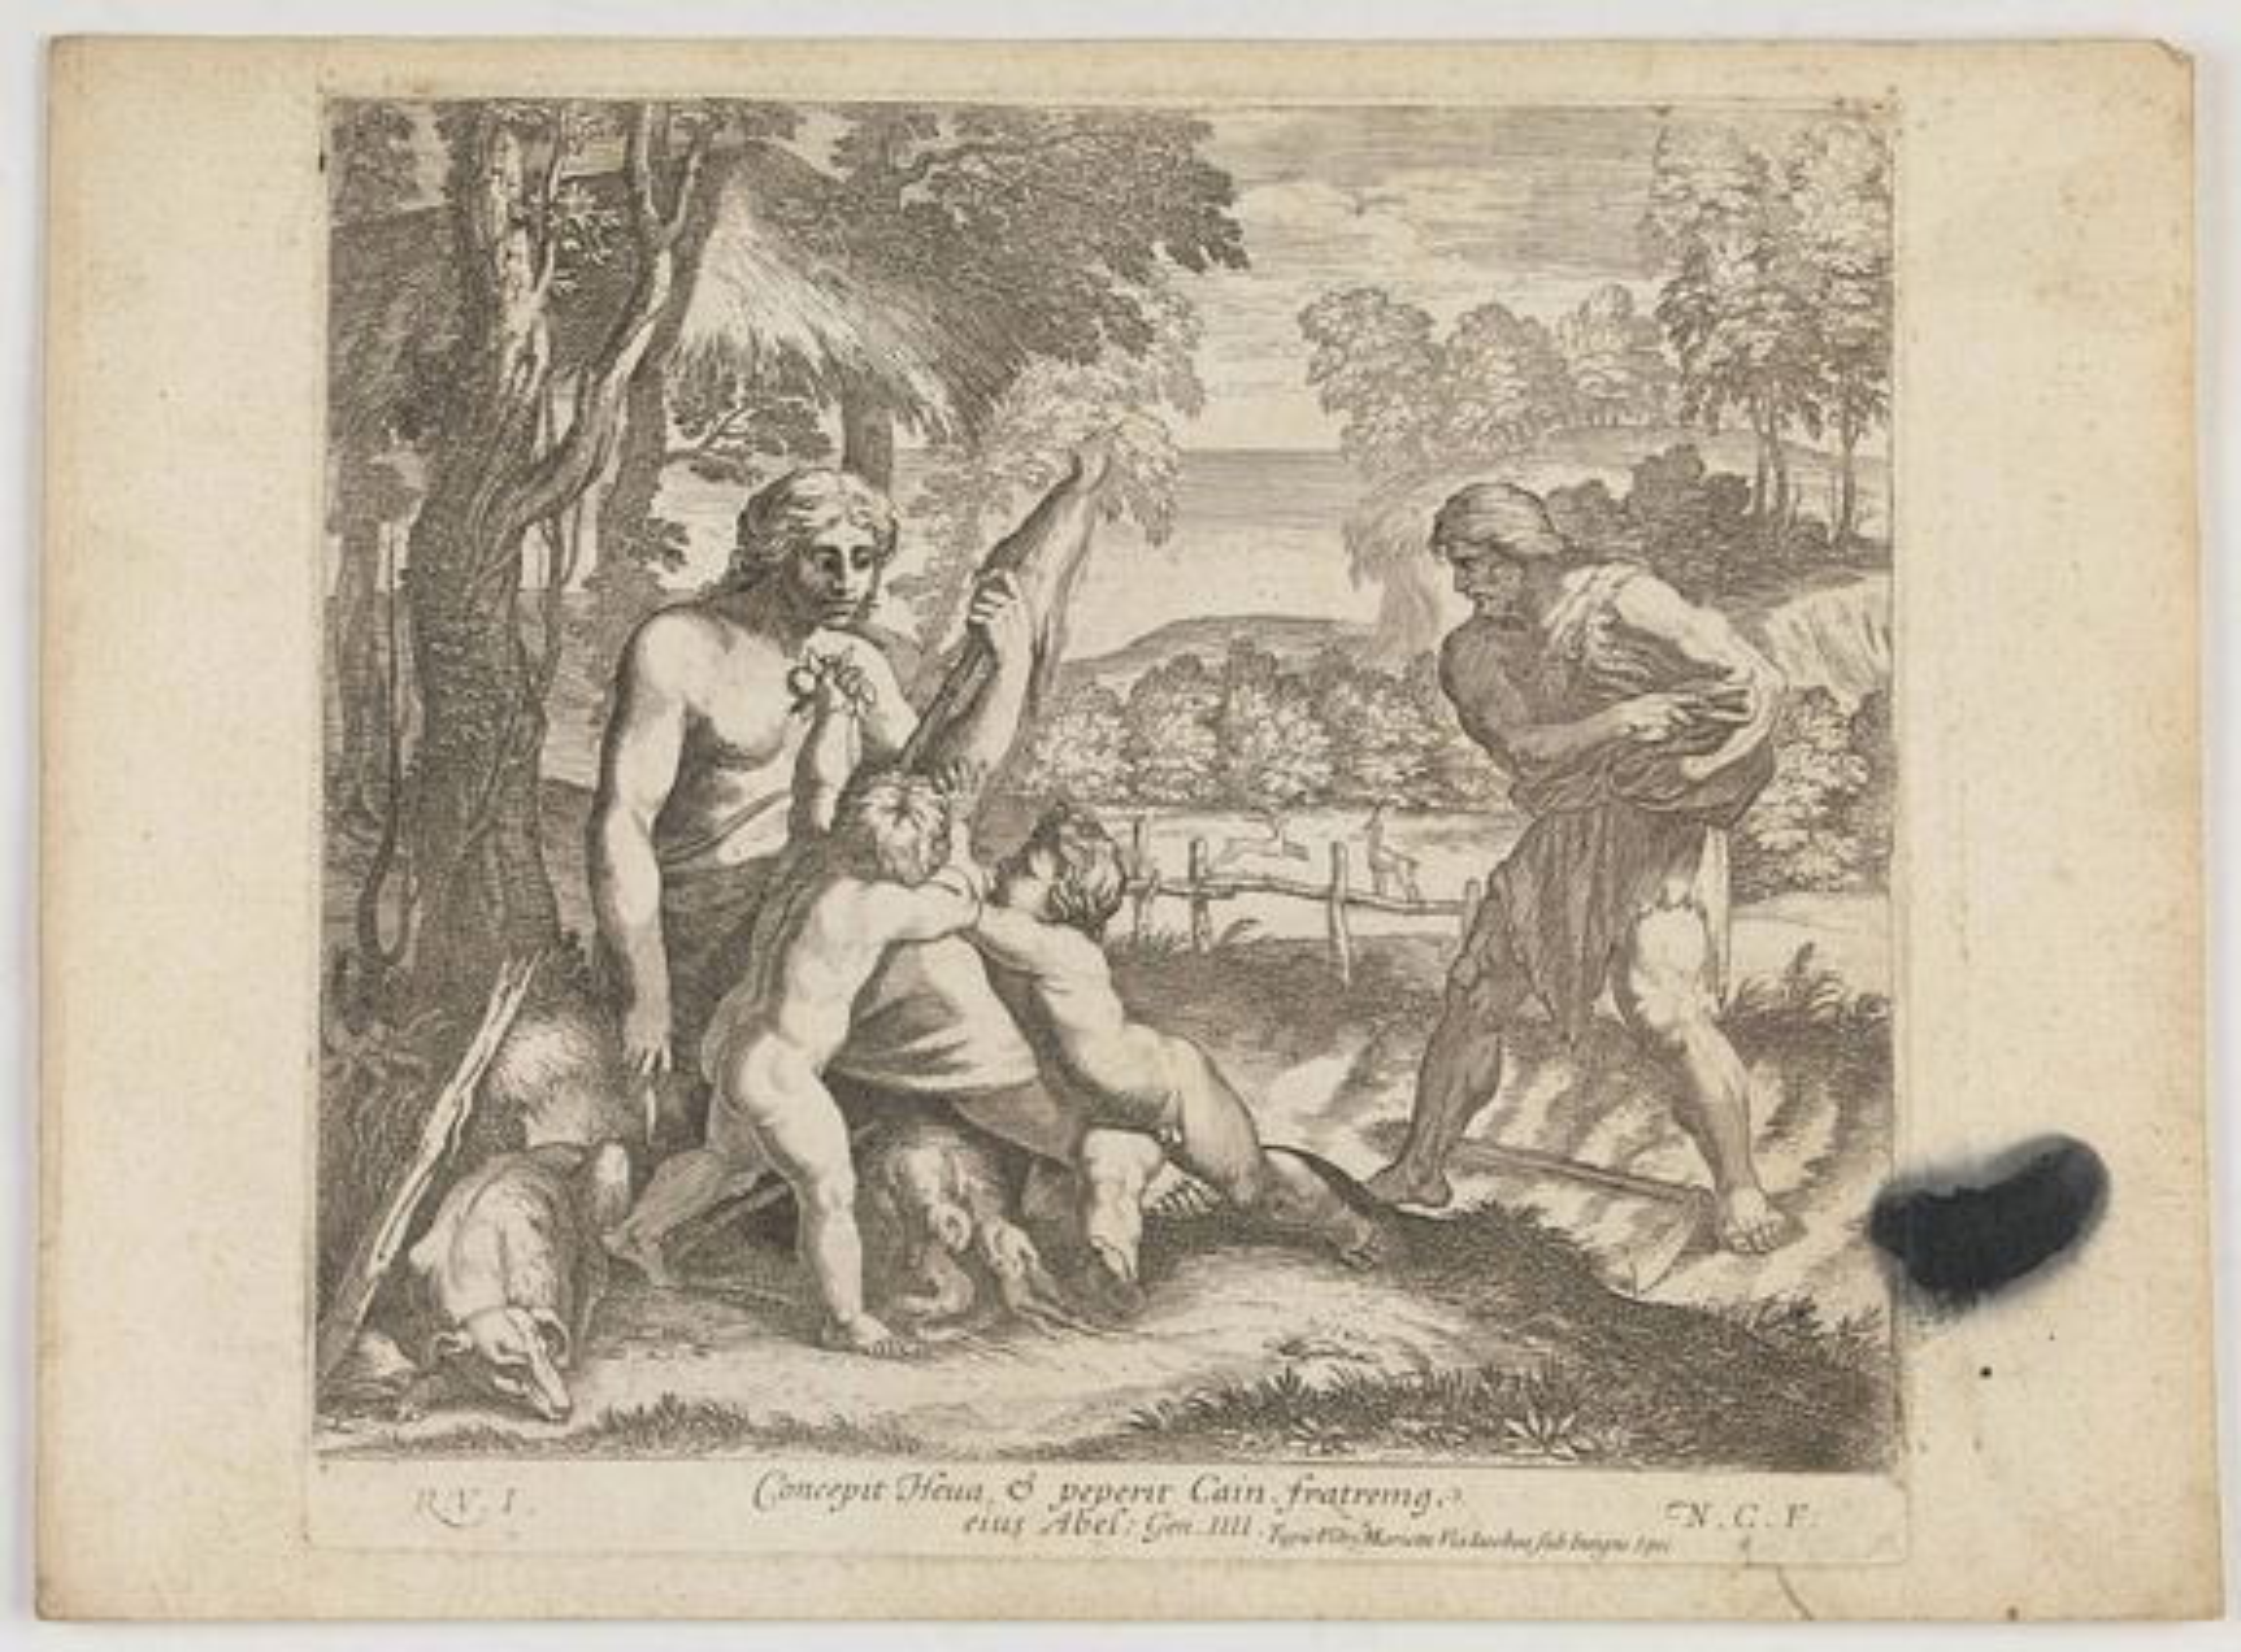 CHAPRON, N. -  Concepit Heua & peperit Cain fratremg eius Abel. . . . (Plate 8)